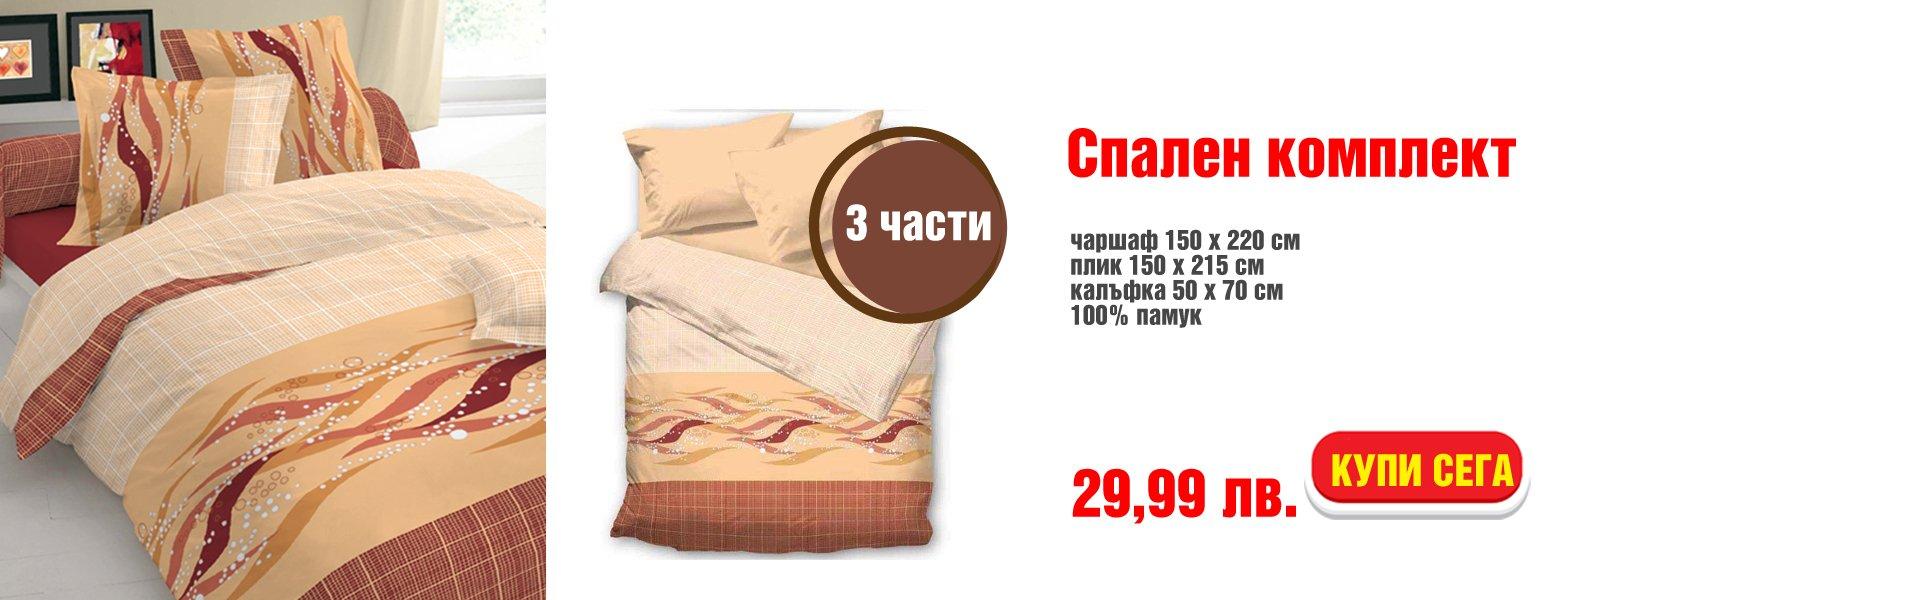 Спален комплект 3 части